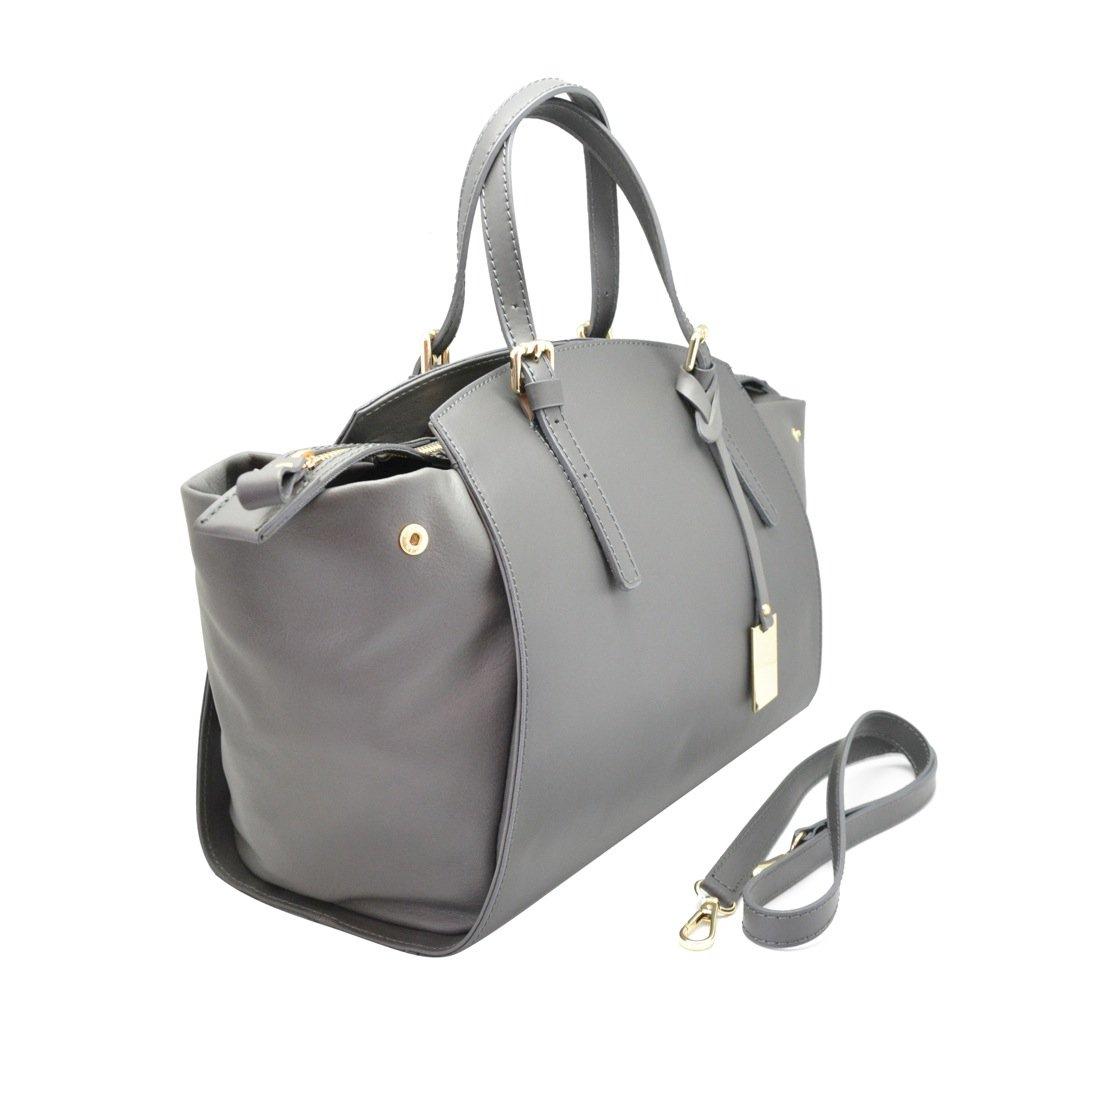 3d4eef93aab DALILA Italian Handbag smooth and soft leatheradjustable shoulder strap shoulder  purse Made in Italy  Handbags  Amazon.com